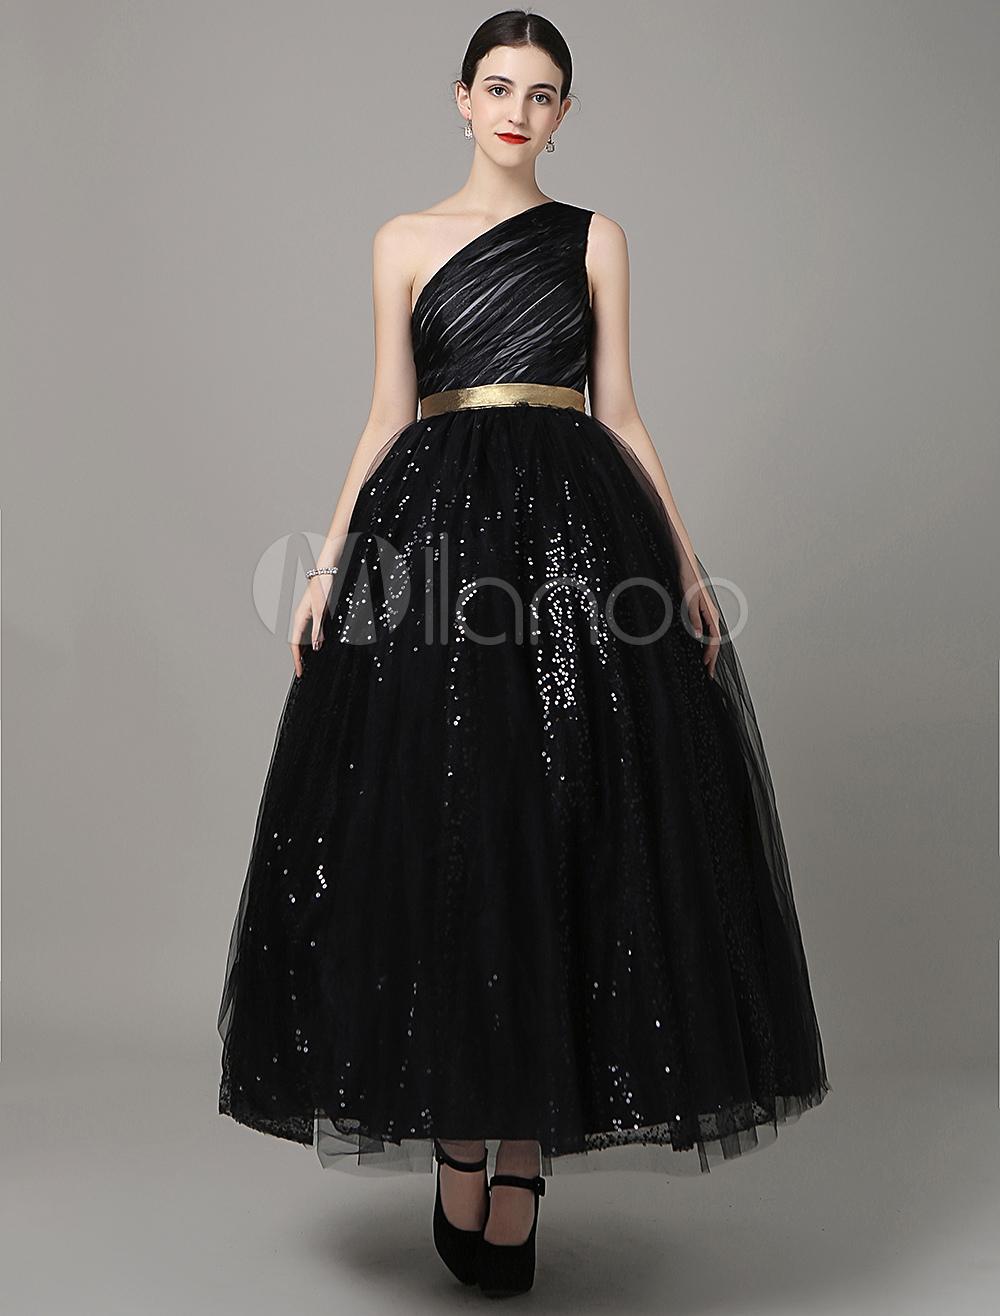 Black Prom Dresses 2018 Long One Shoulder Sequins Evening Dress Asymmetrical Satin Sash Prom Dress Milanoo